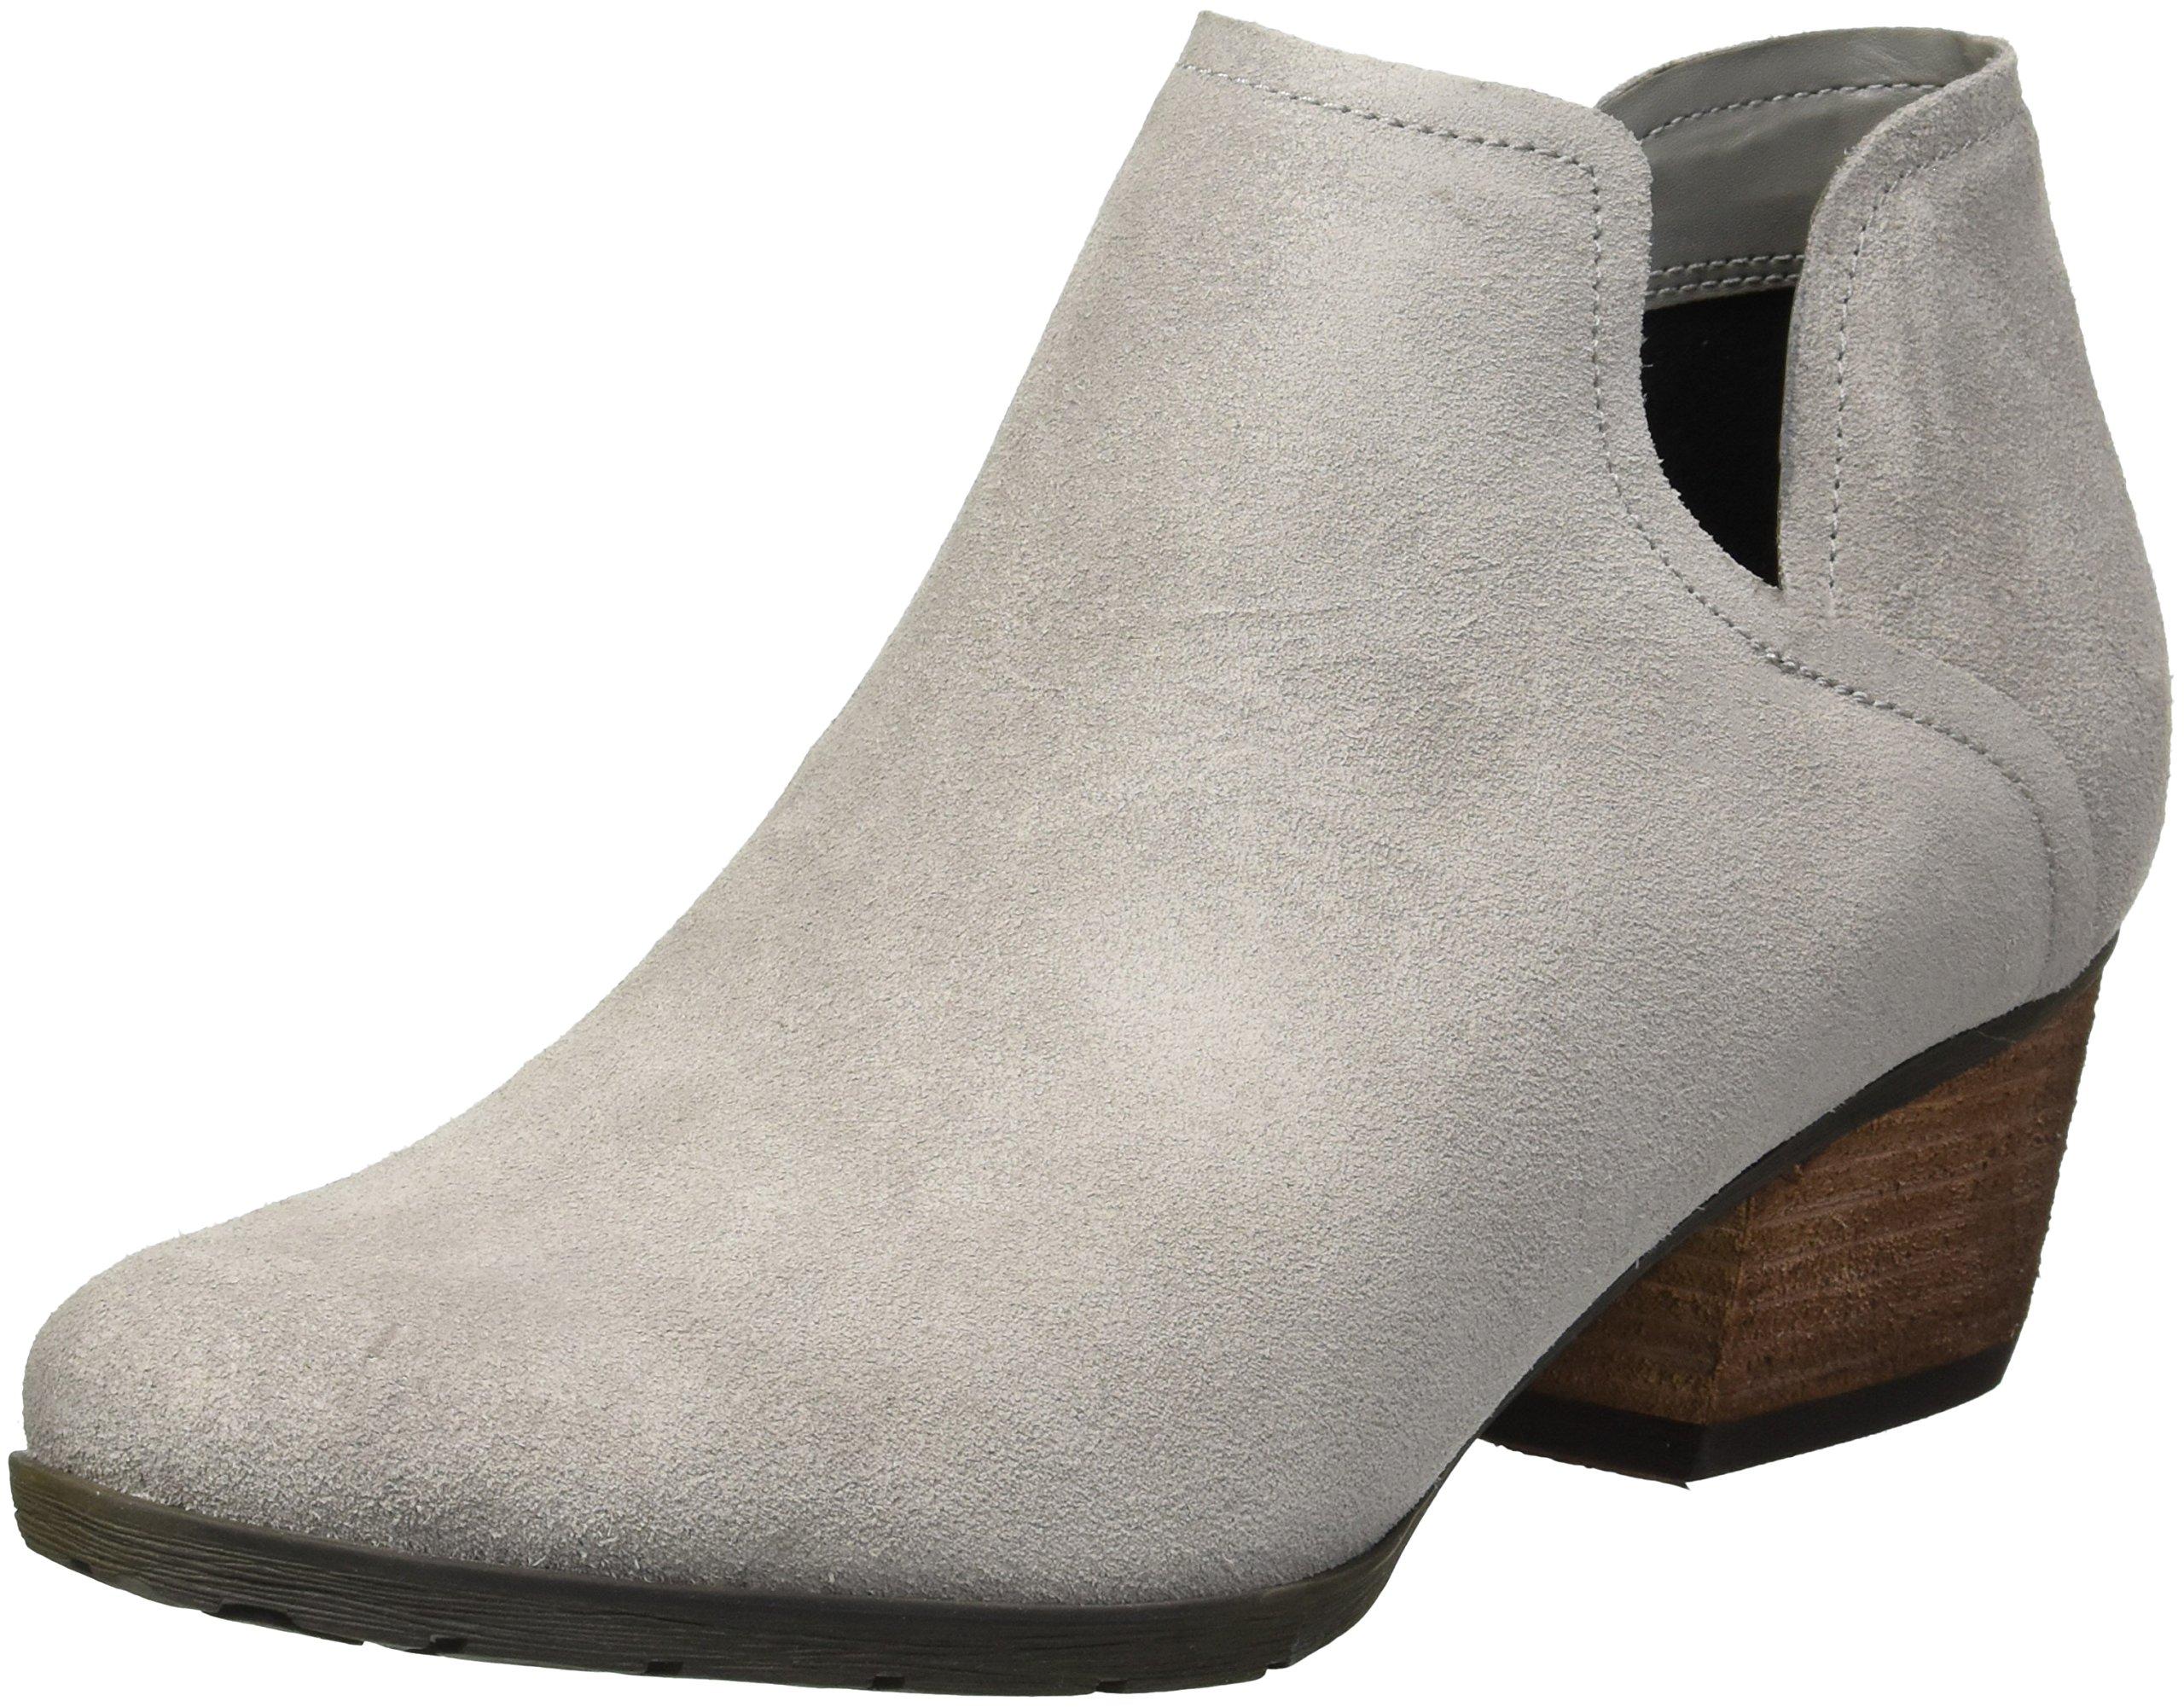 Blondo Women's Victoria Waterproof Rain Shoe, Light Grey Suede, 8 M US